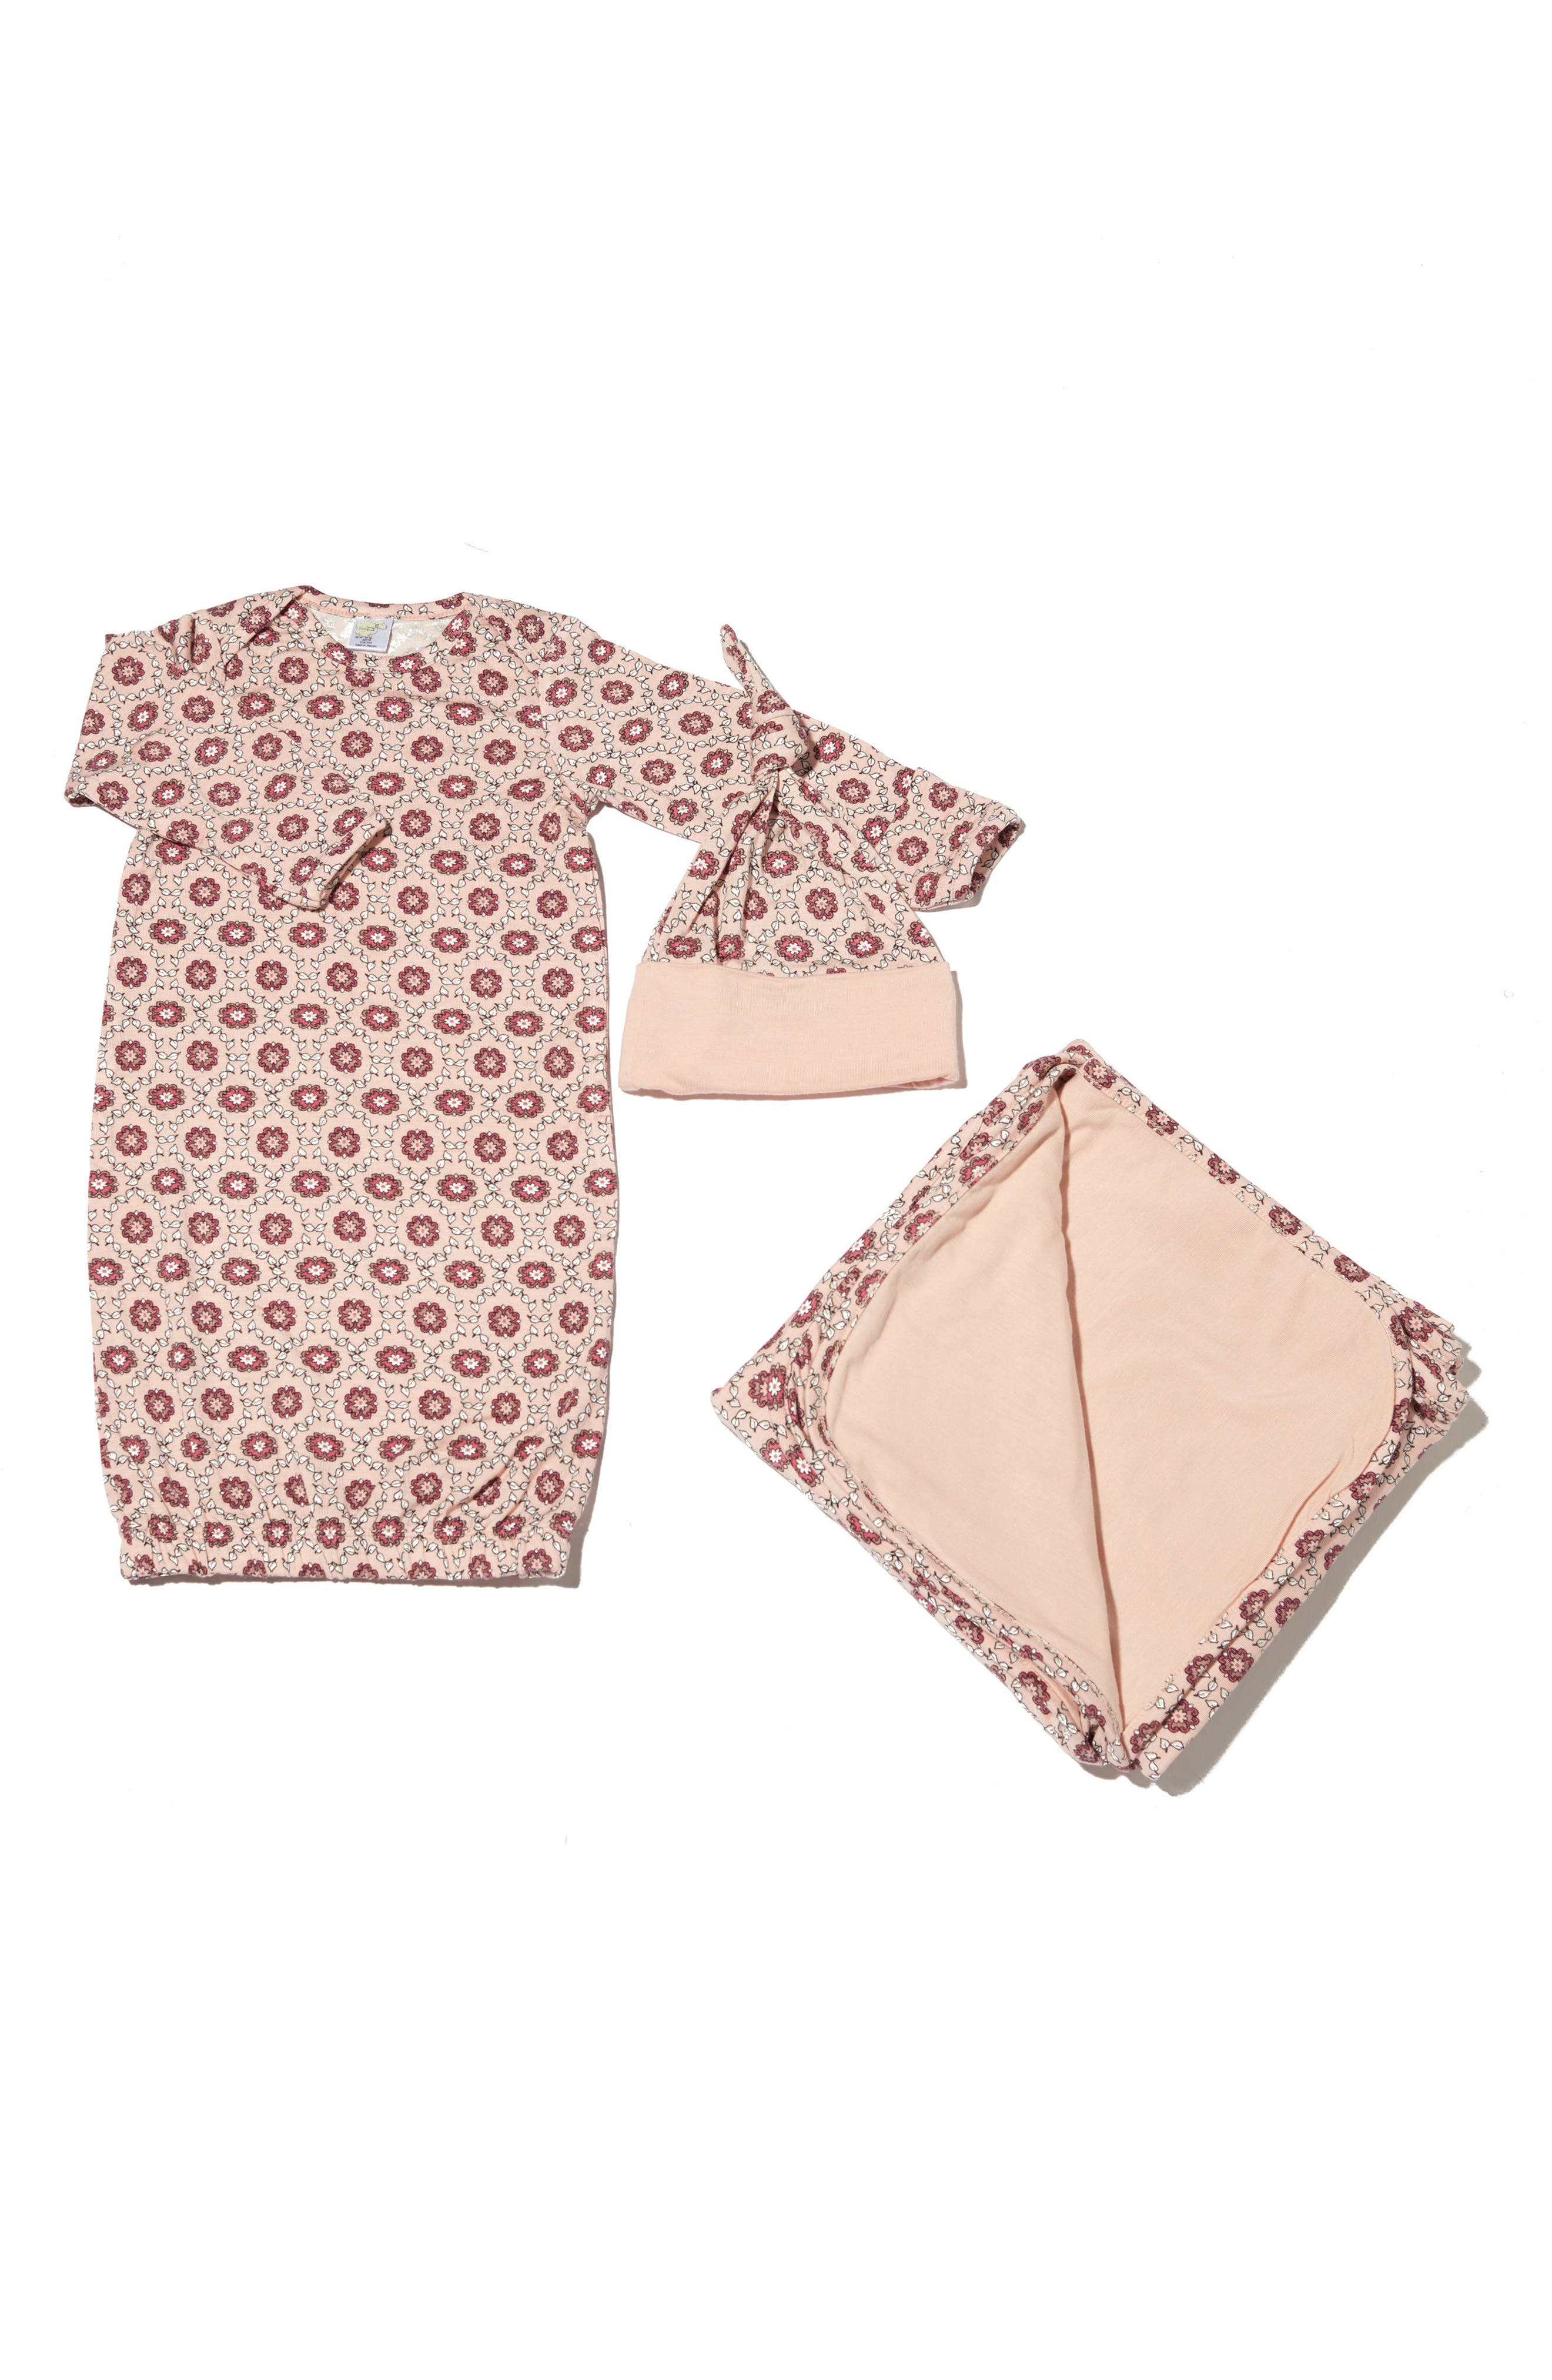 Print Gown, Hat & Blanket Set,                             Main thumbnail 1, color,                             Blush Pink